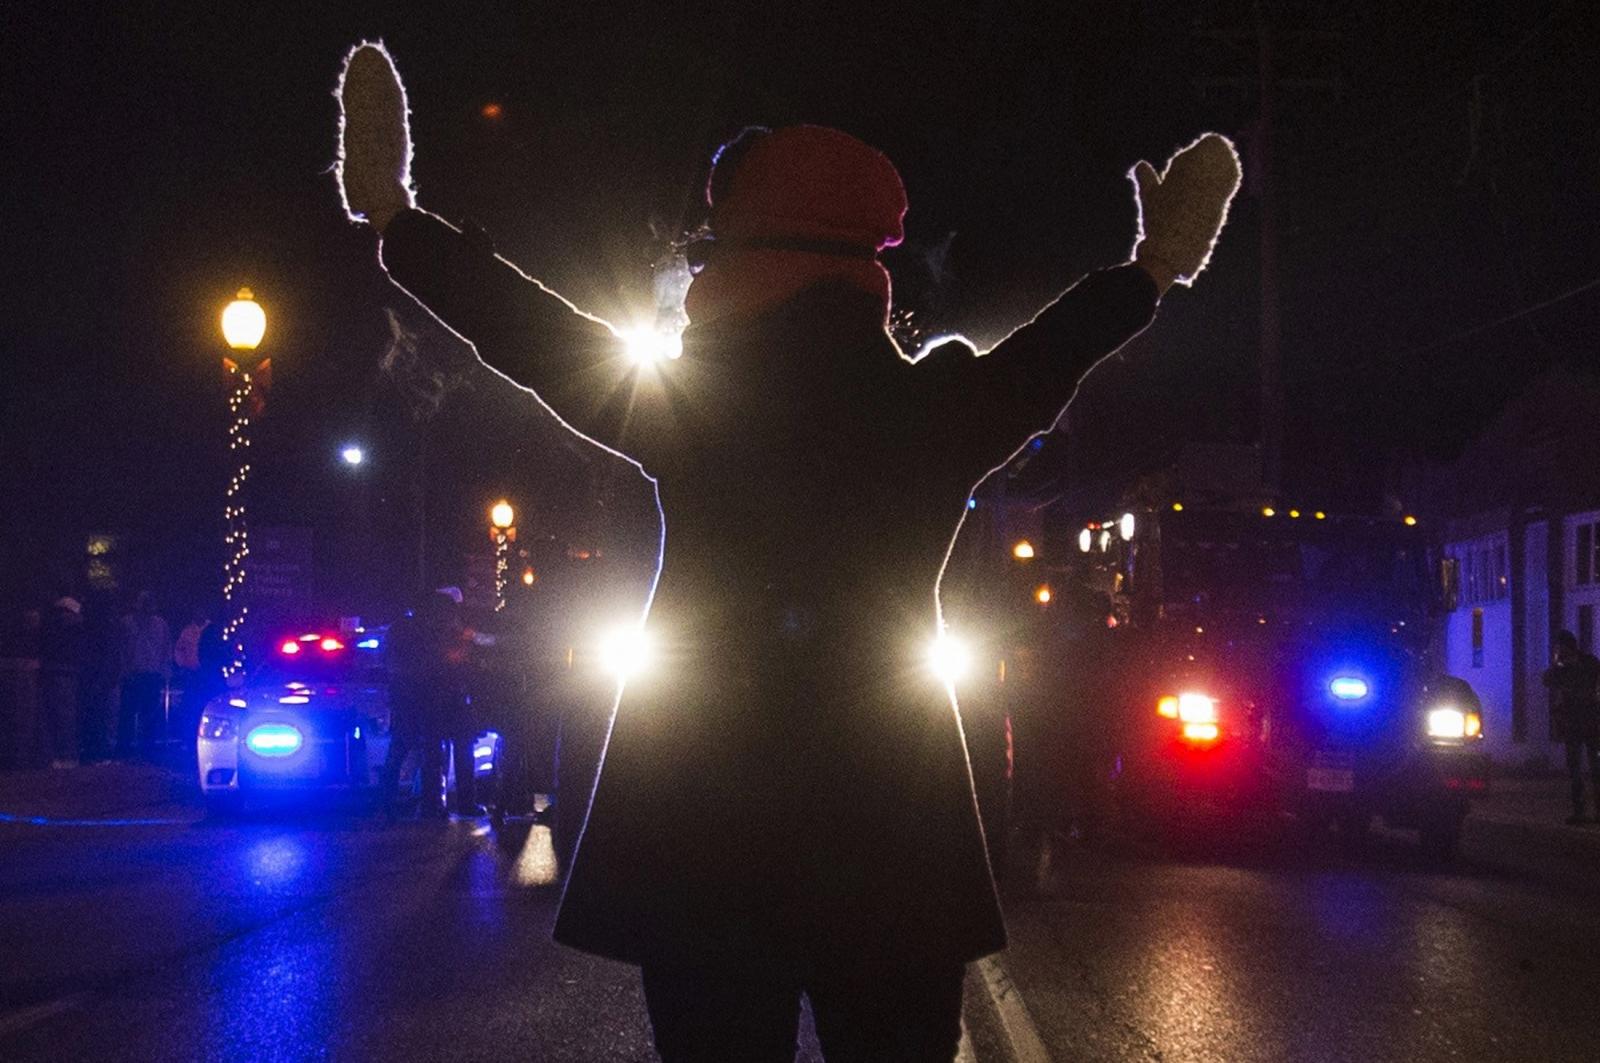 Ferguson: Two FBI Agents Shot as Michael Brown Protests Rage